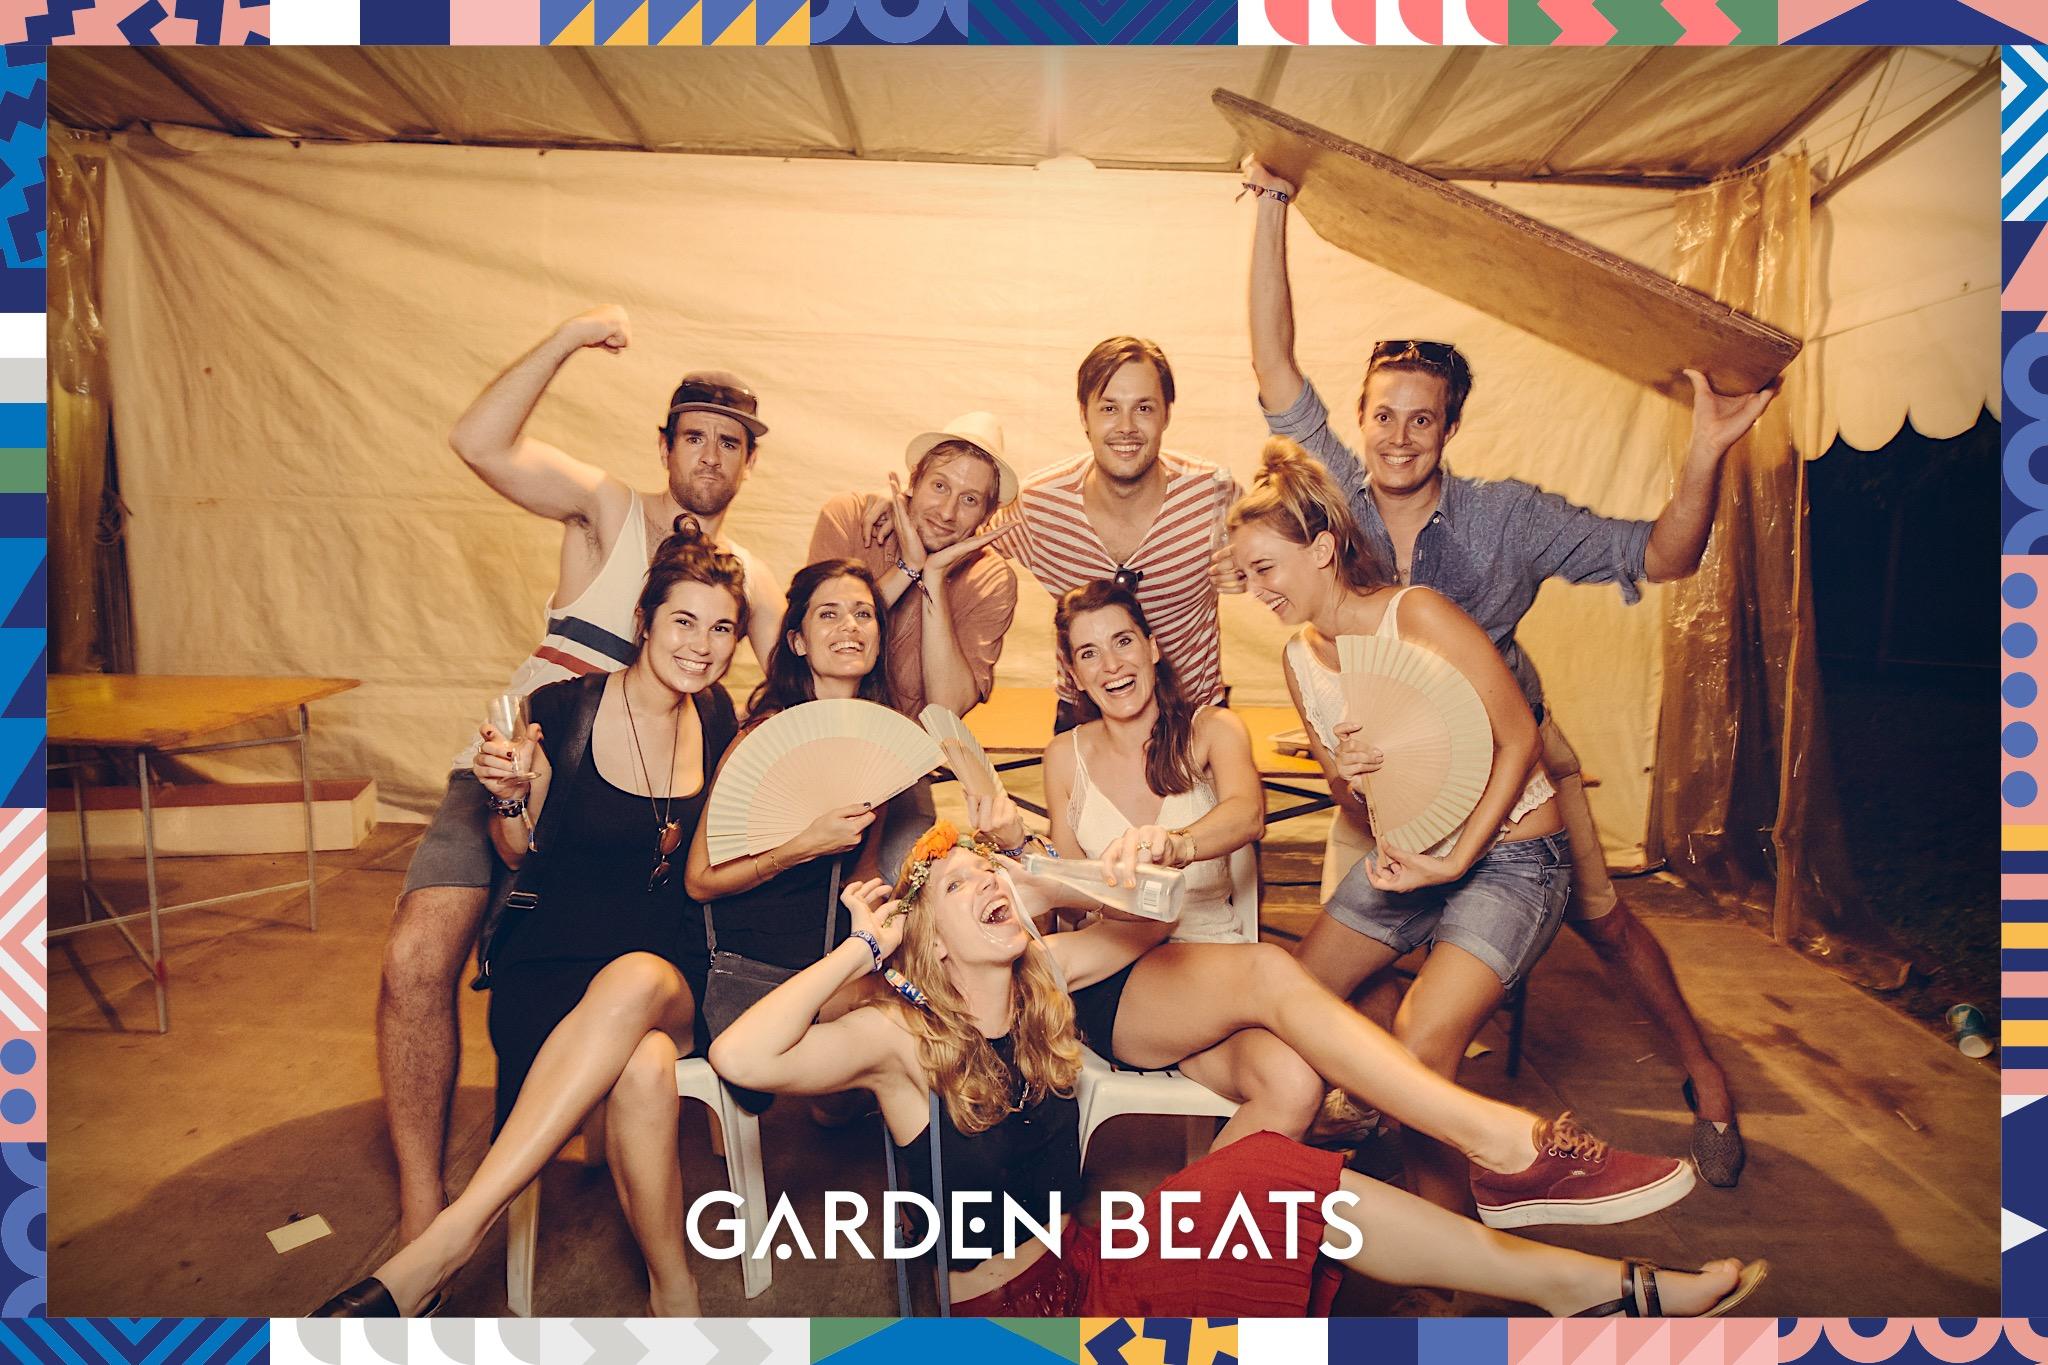 18032017_GardenBeats_Colossal854_WatermarkedGB.jpg